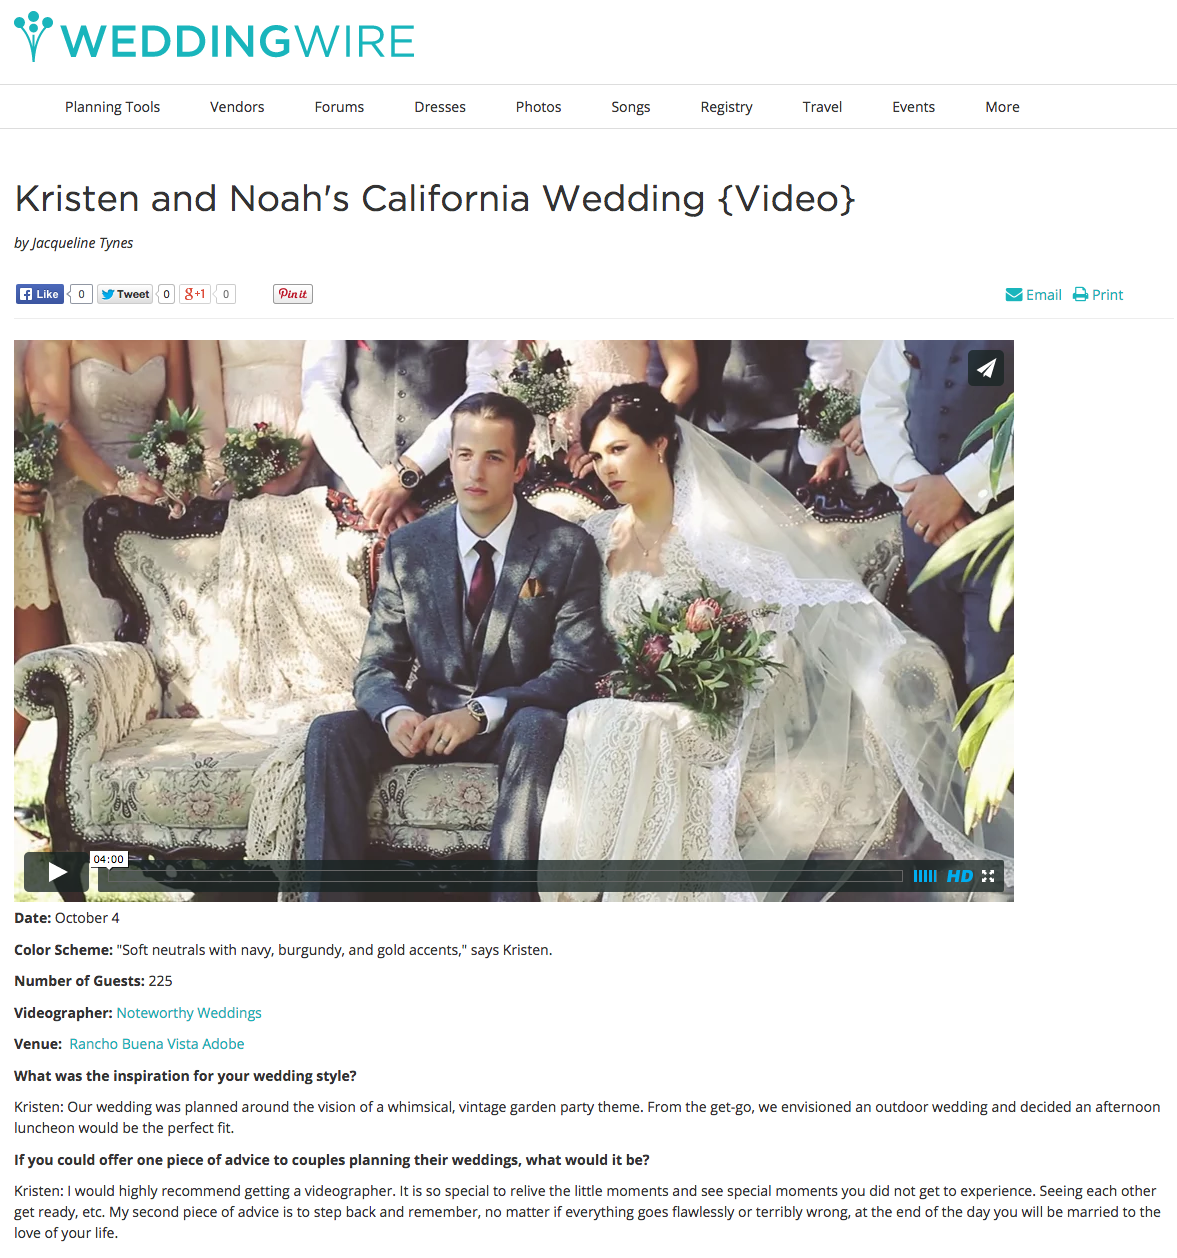 Weddingwire Com Features A Noteworthy Wedding Noteworthy Weddings